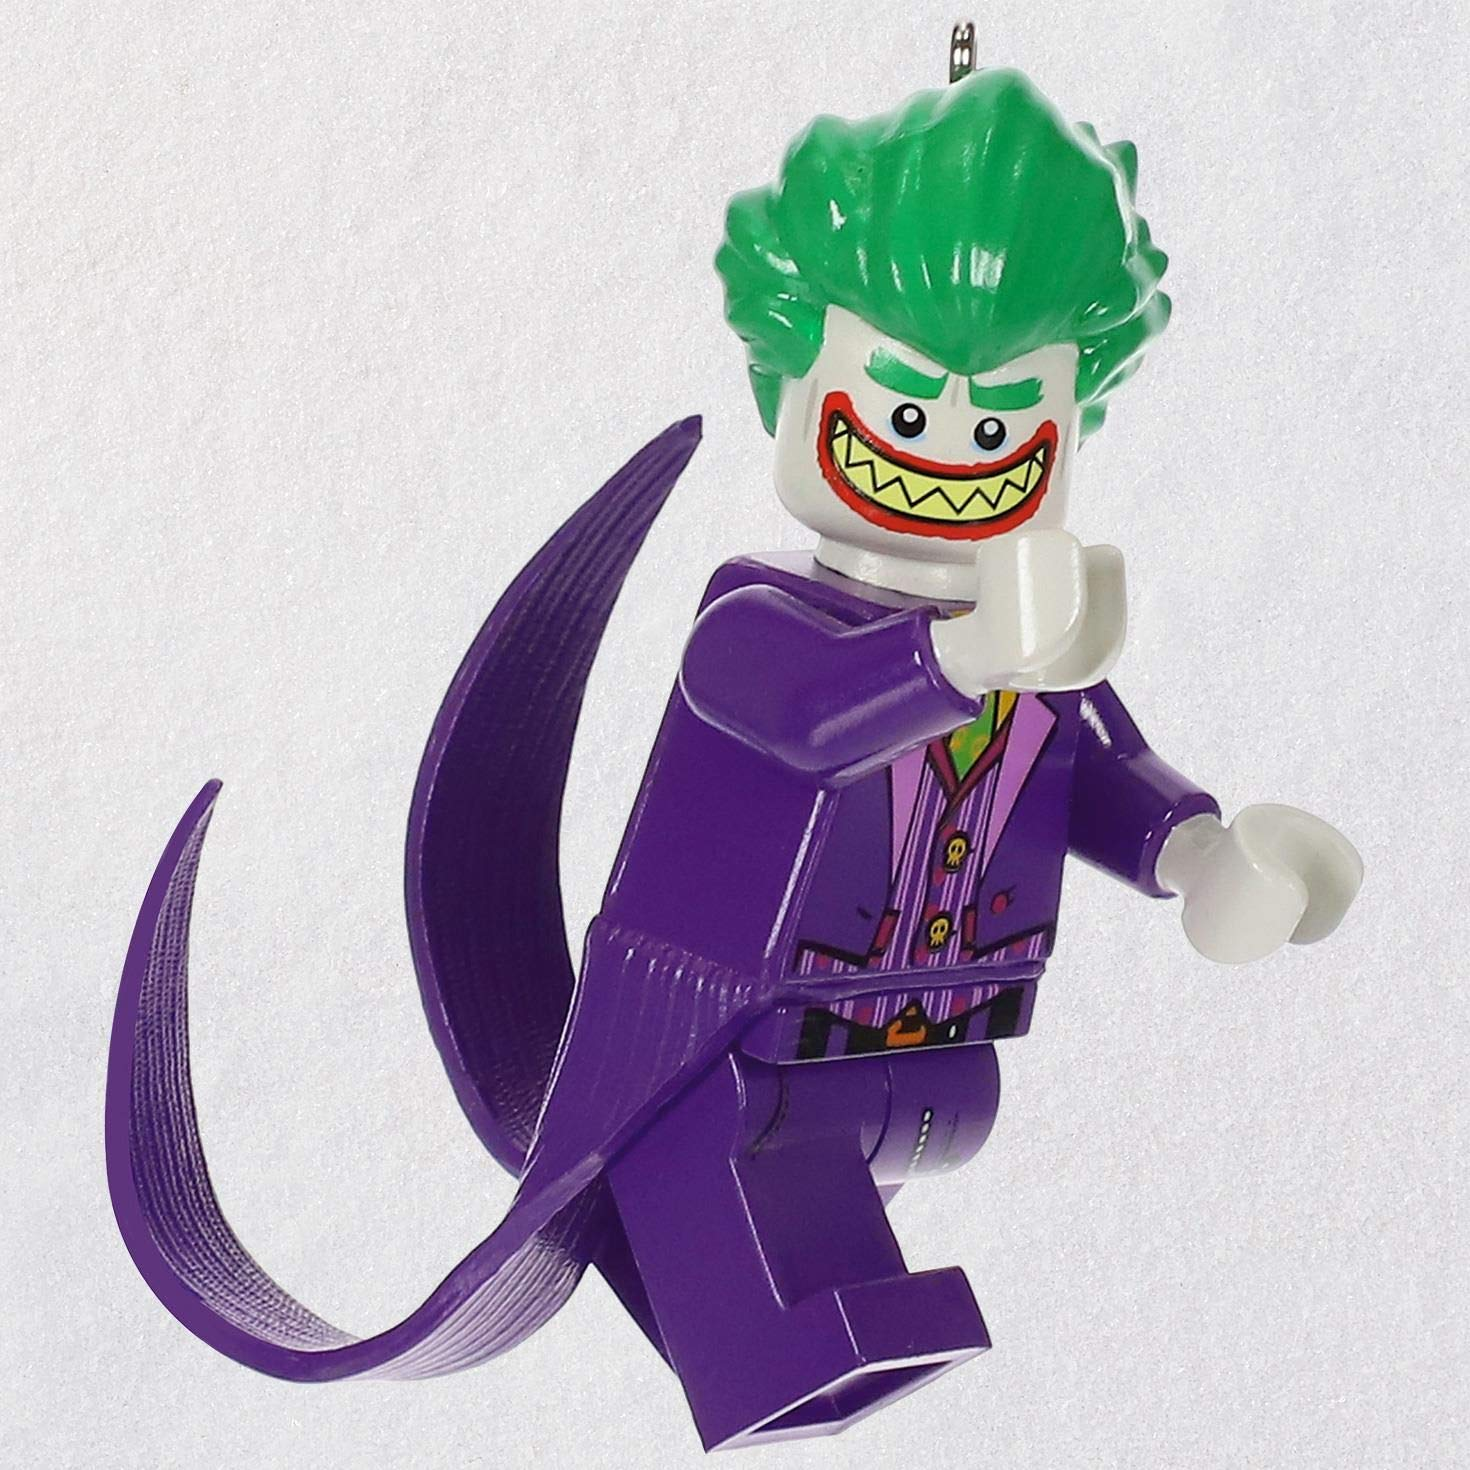 Hallmark The Lego Batman Movie The Joker Ornament Movies & TV,Superheroes,Hobbies & Interests,Toys & Gaming